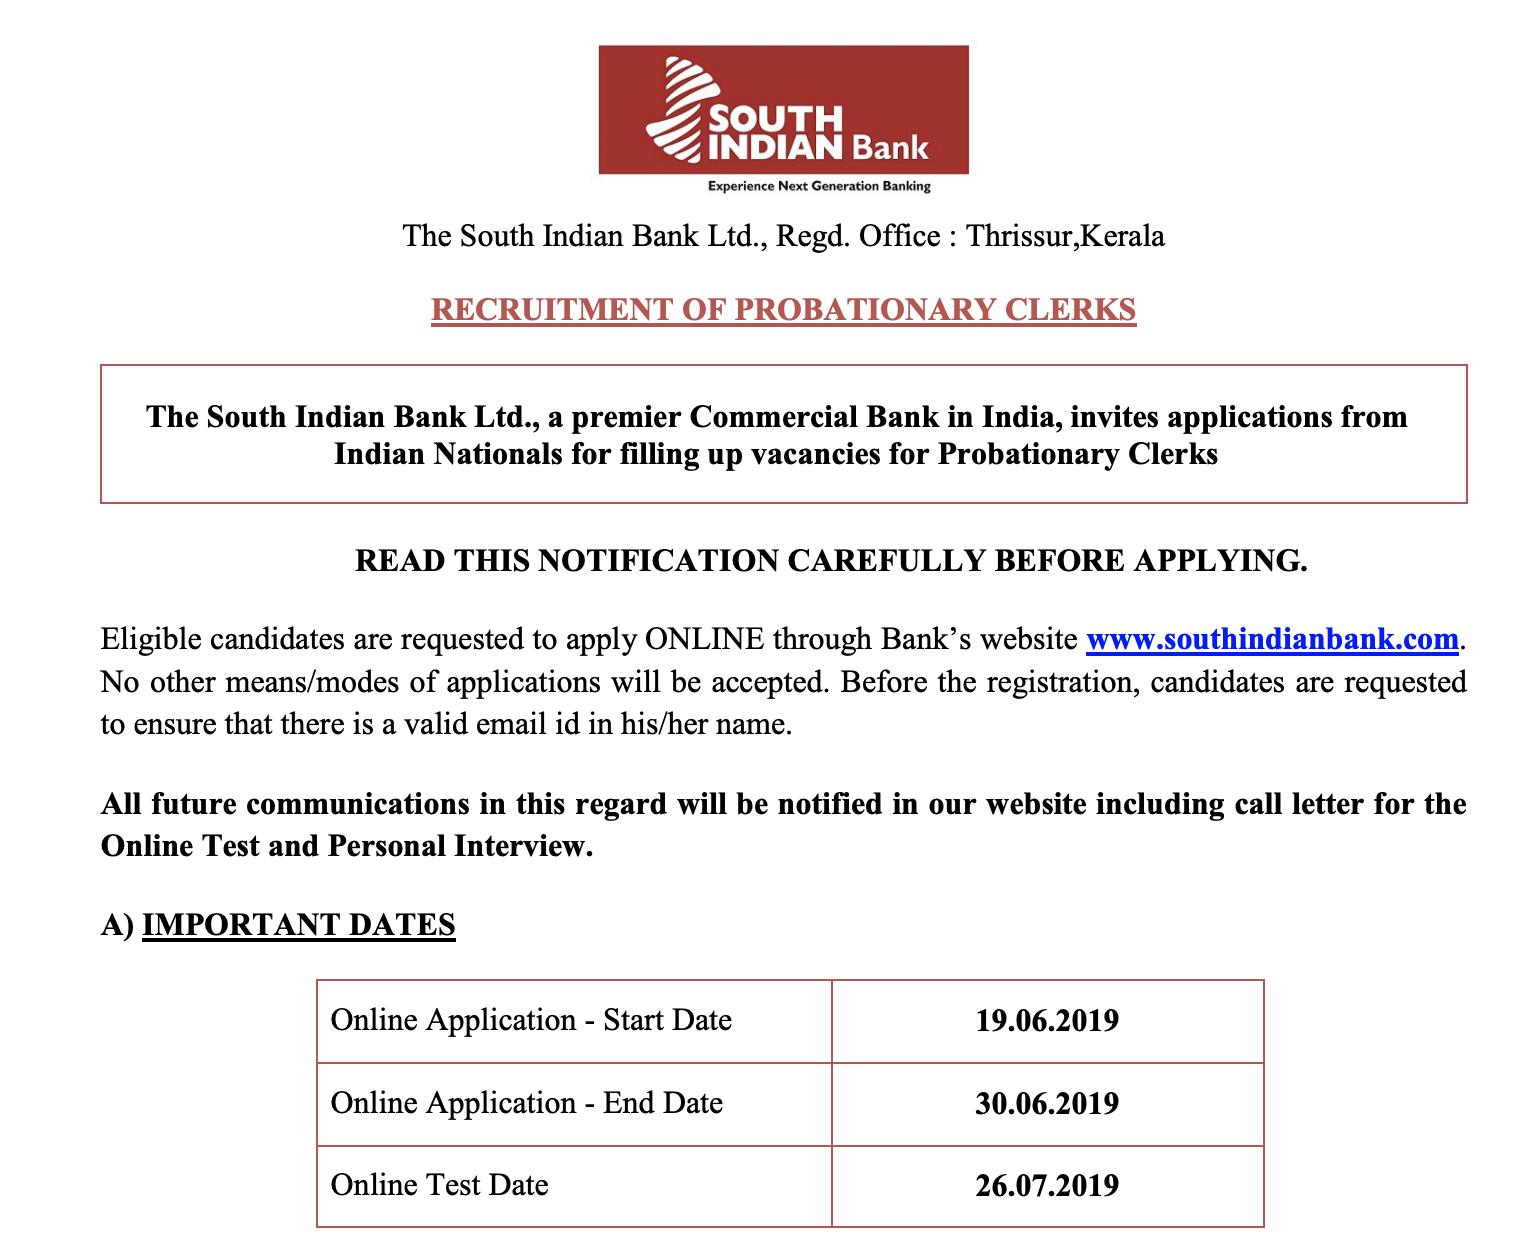 South Indian Bank Probationary Clerk Recruitment 2019, 540 PO SIB